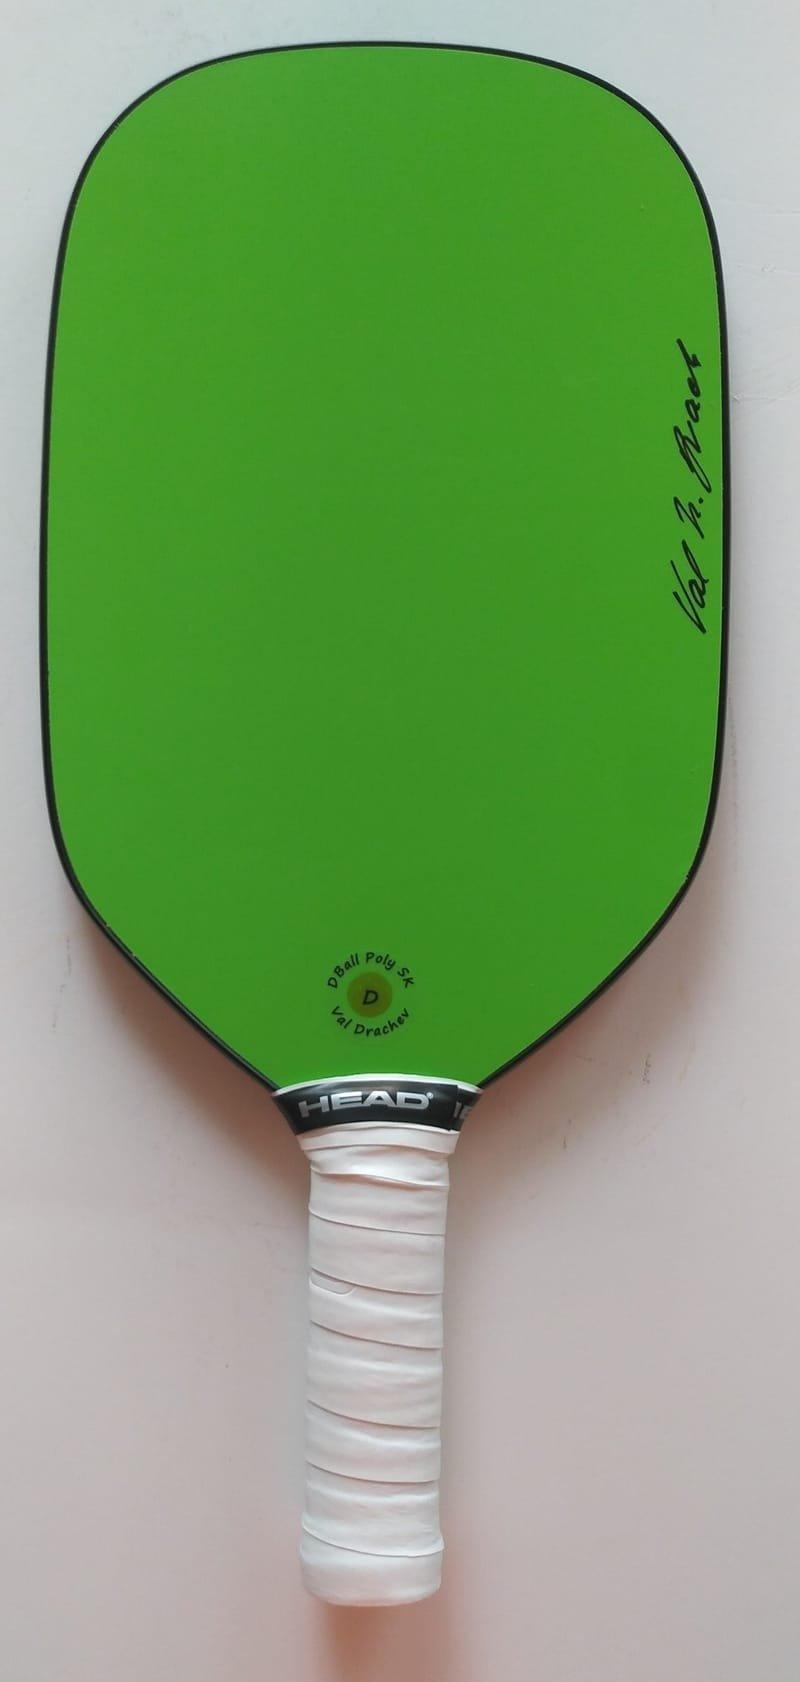 Paddle Shape SK  (Sharp Knife)